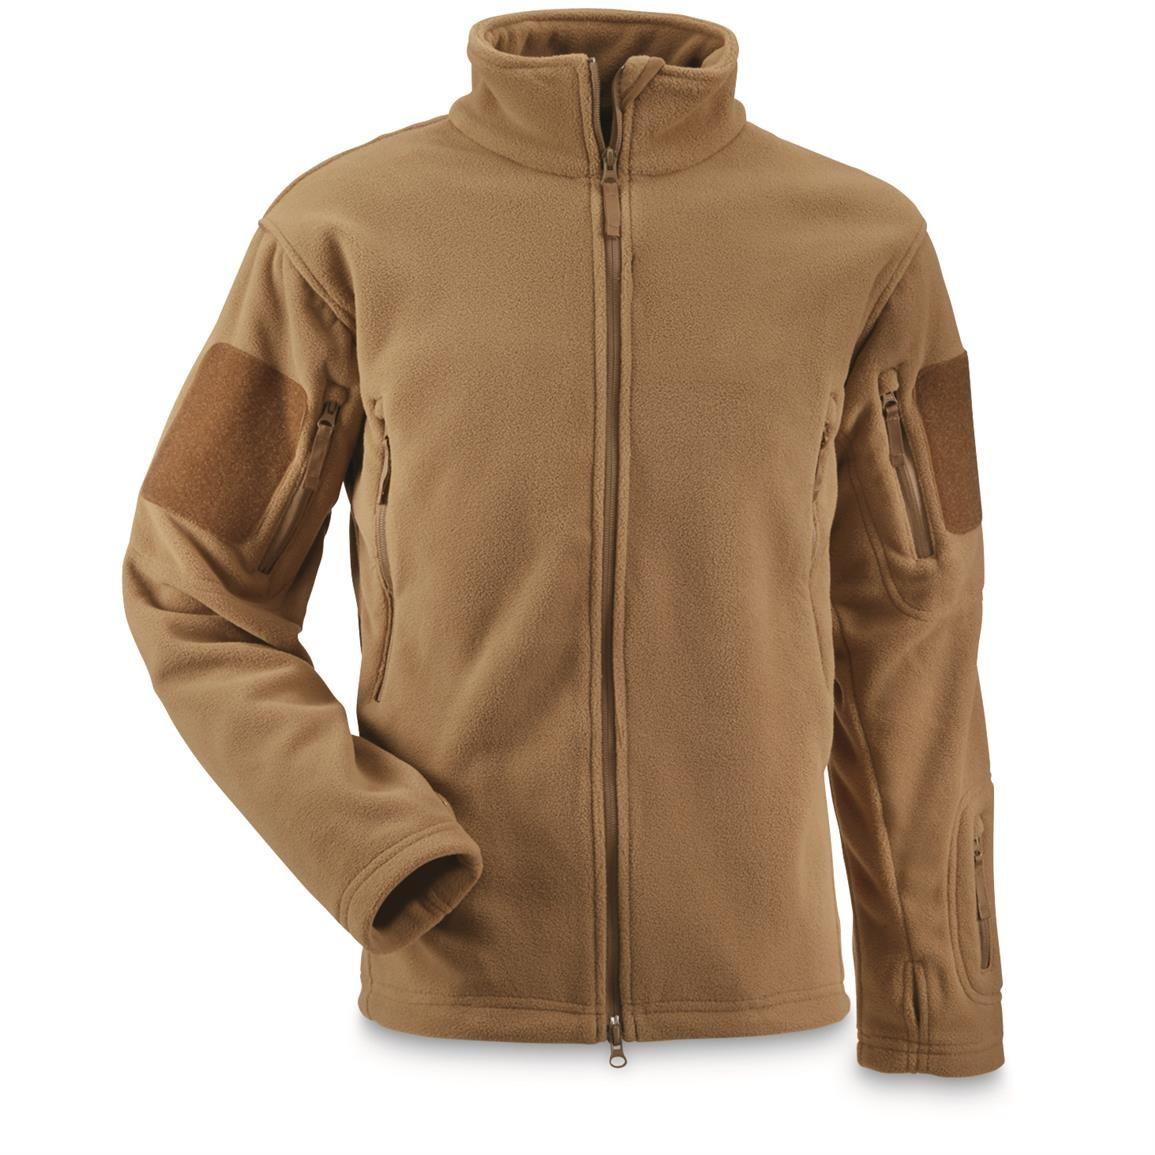 U.S. Military Surplus Fleece Tactical Jacket, New